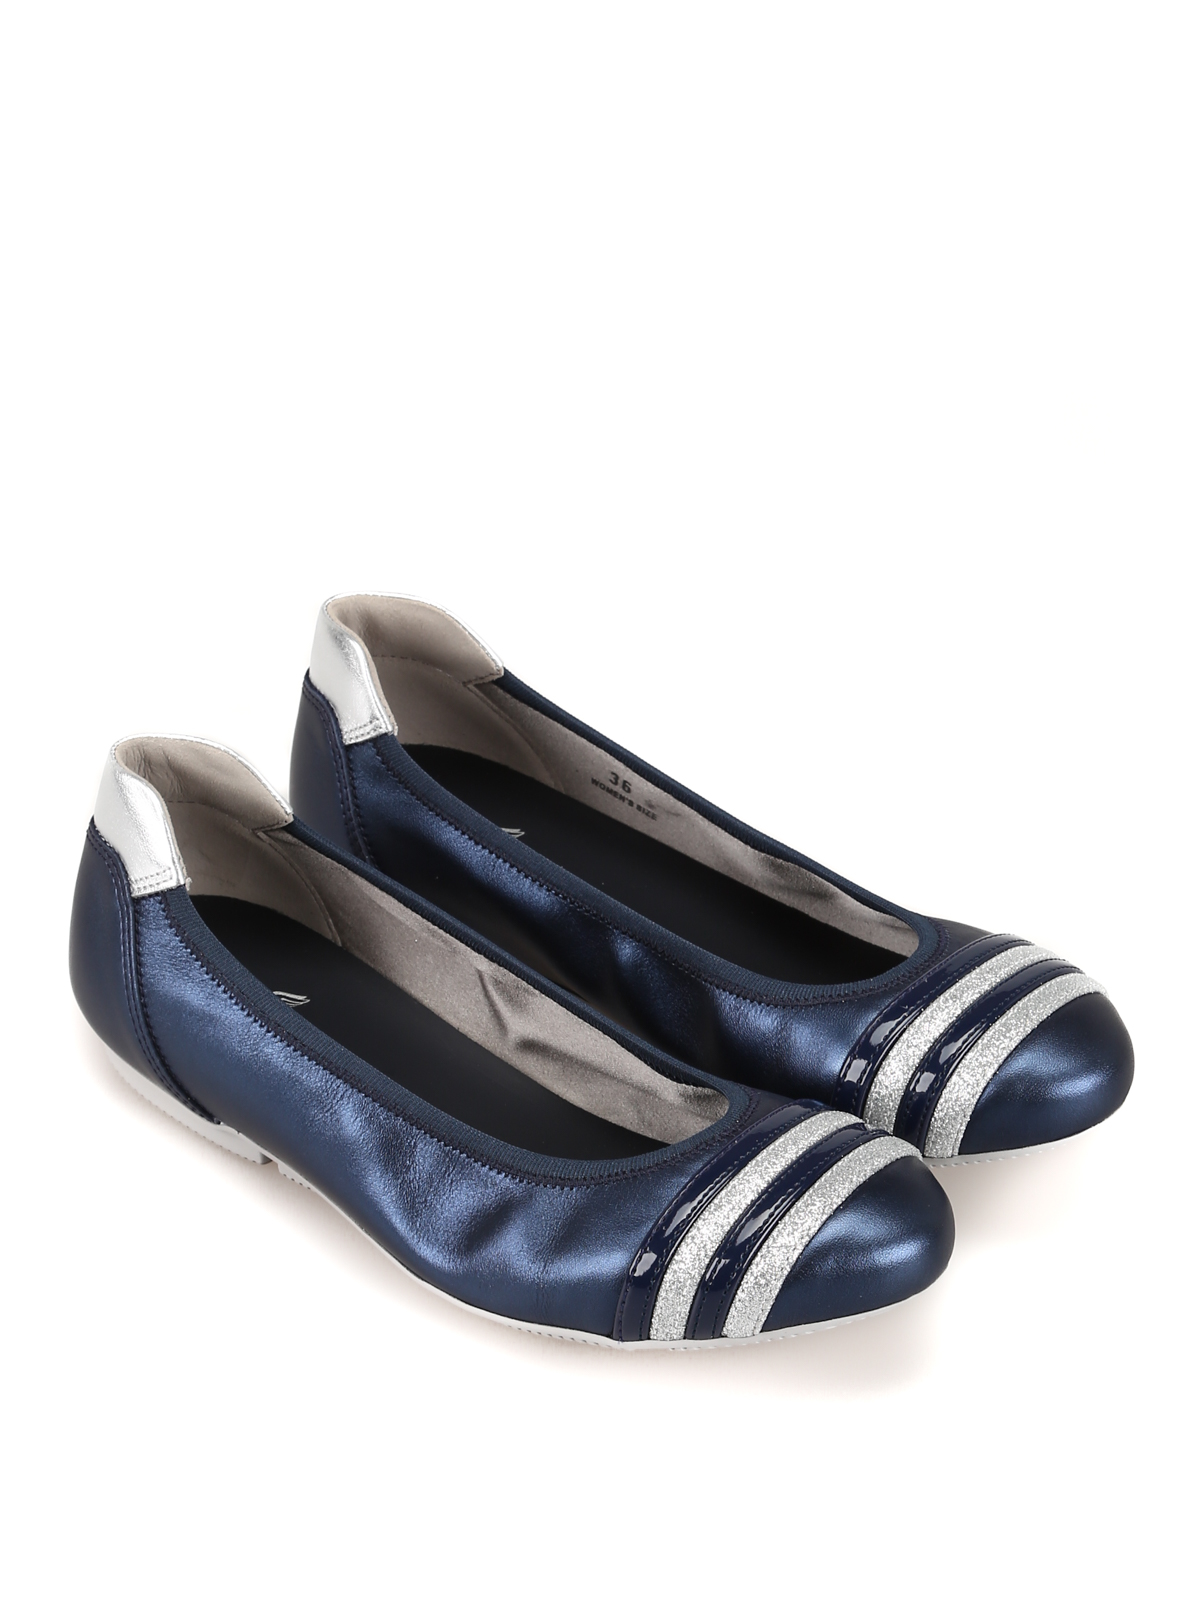 2hogan ballerine blu